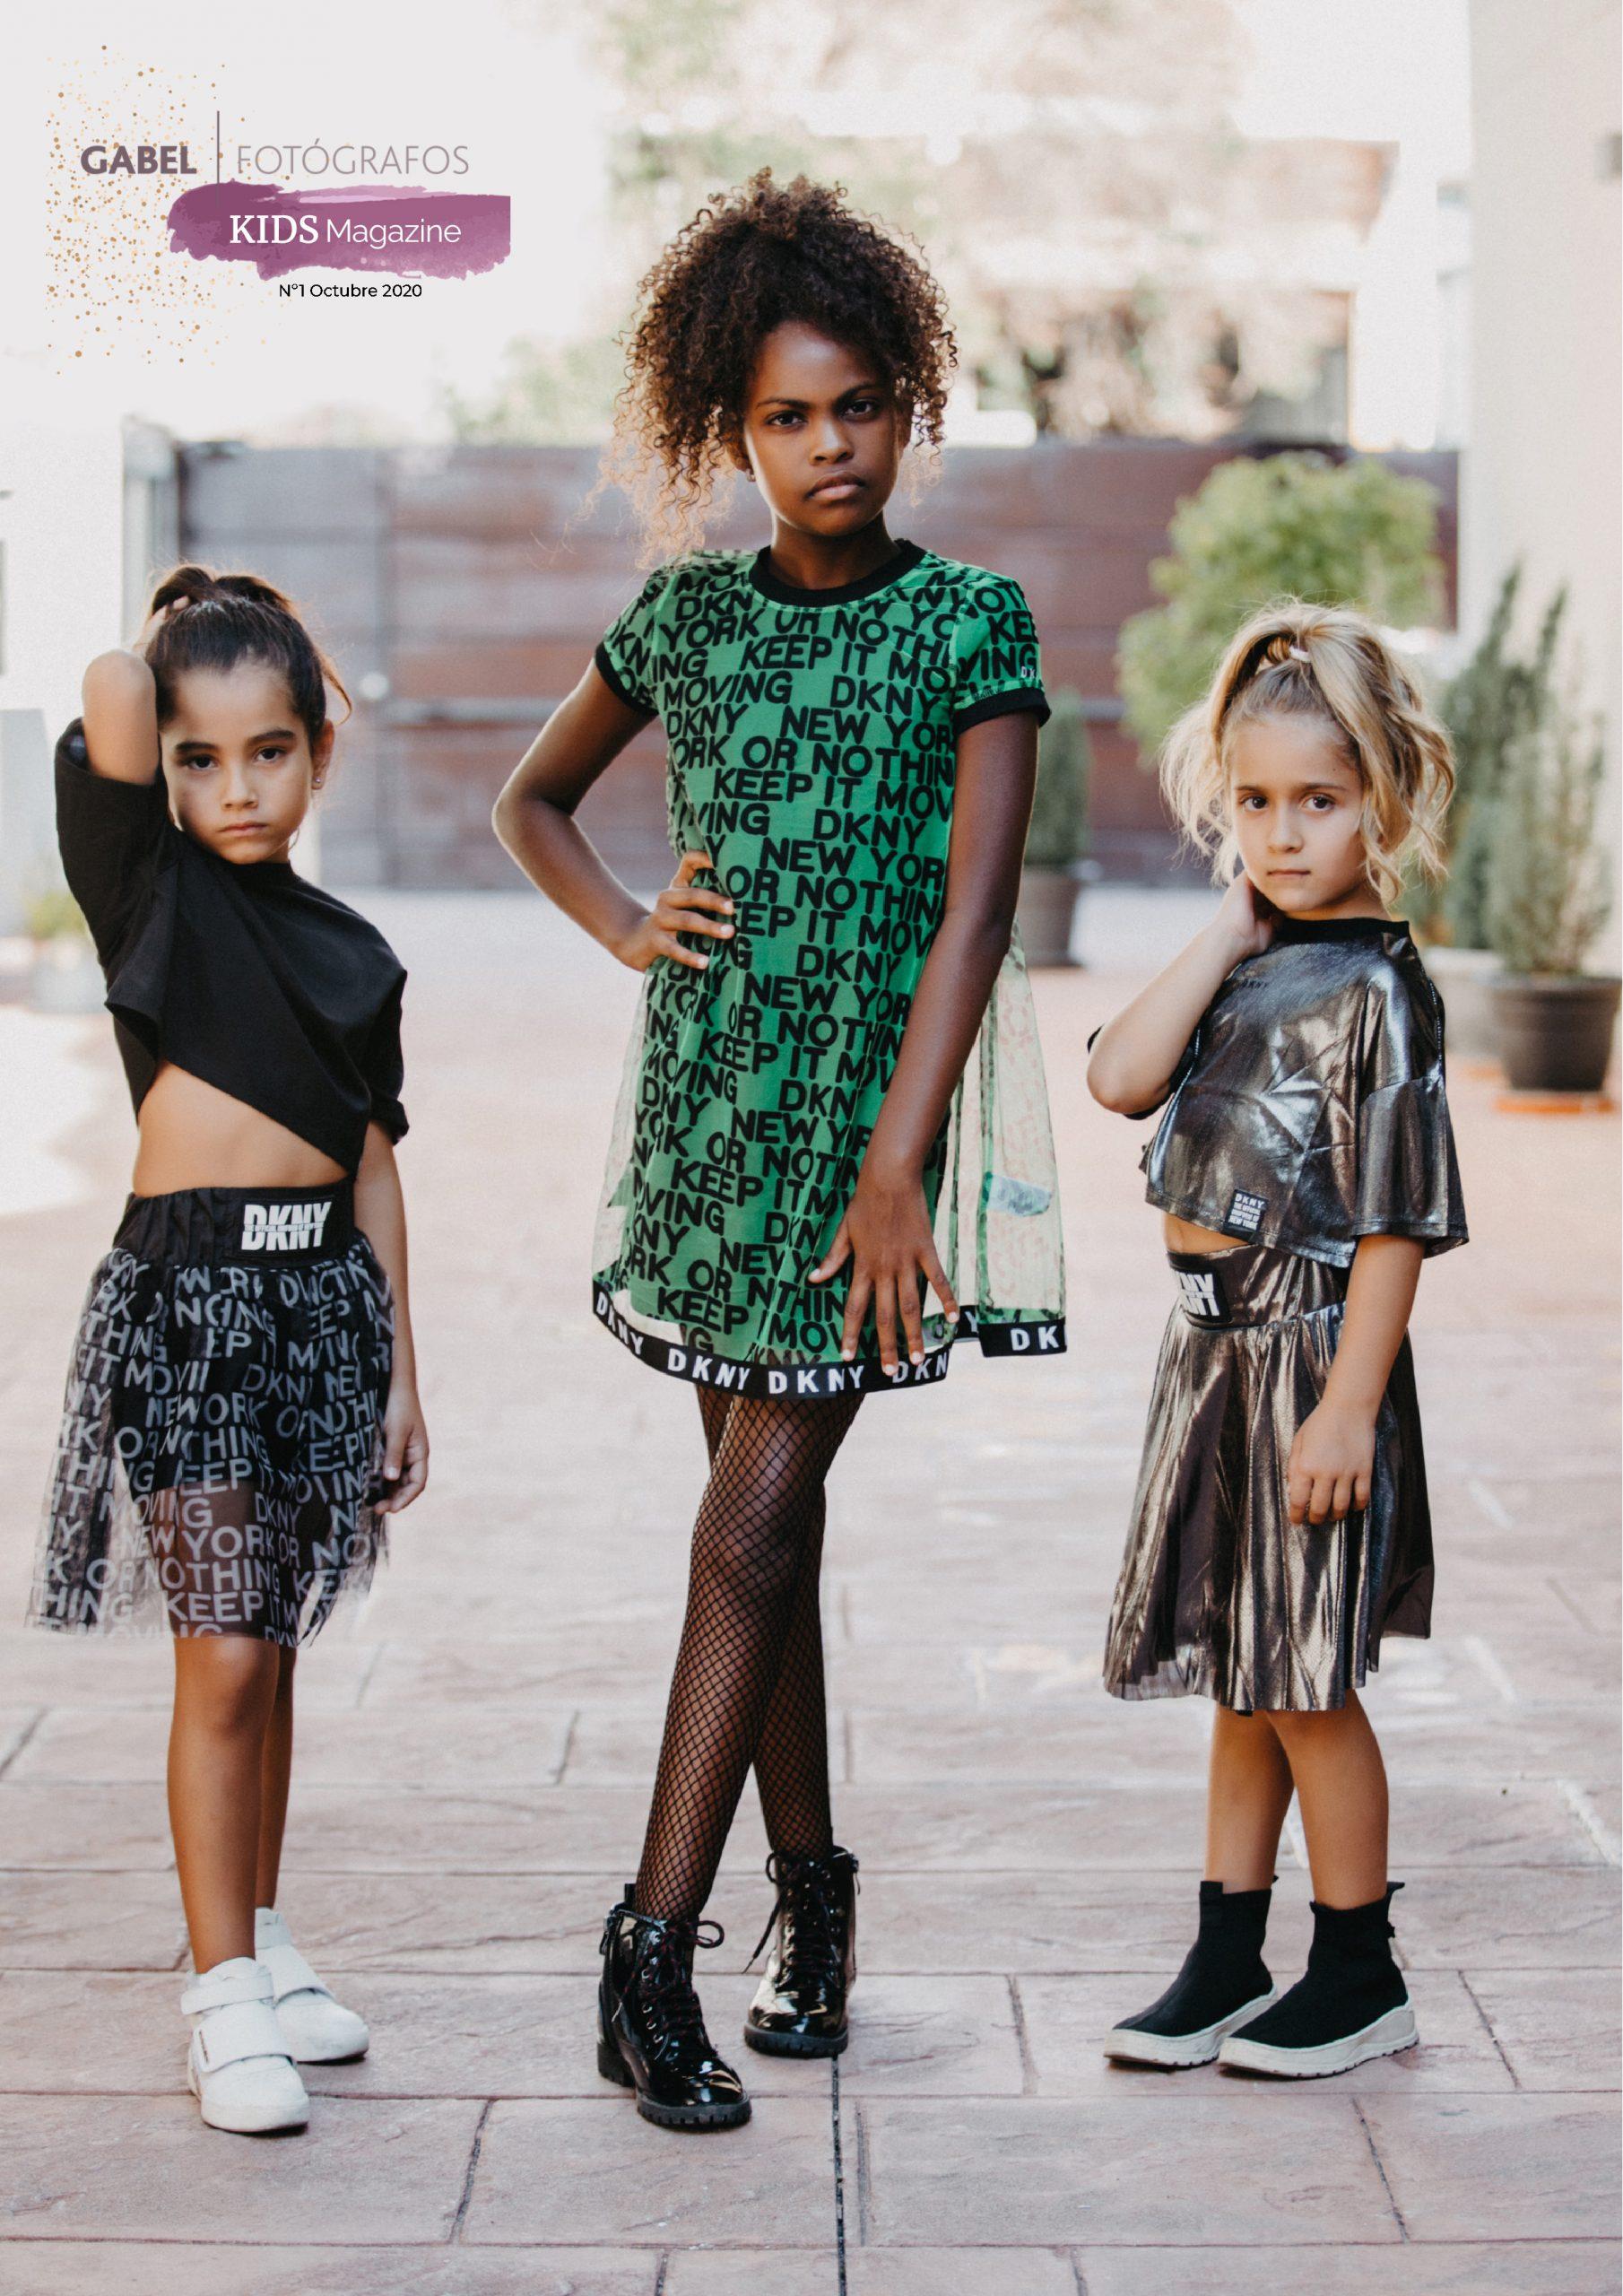 GabelFotografos Kids Magazine